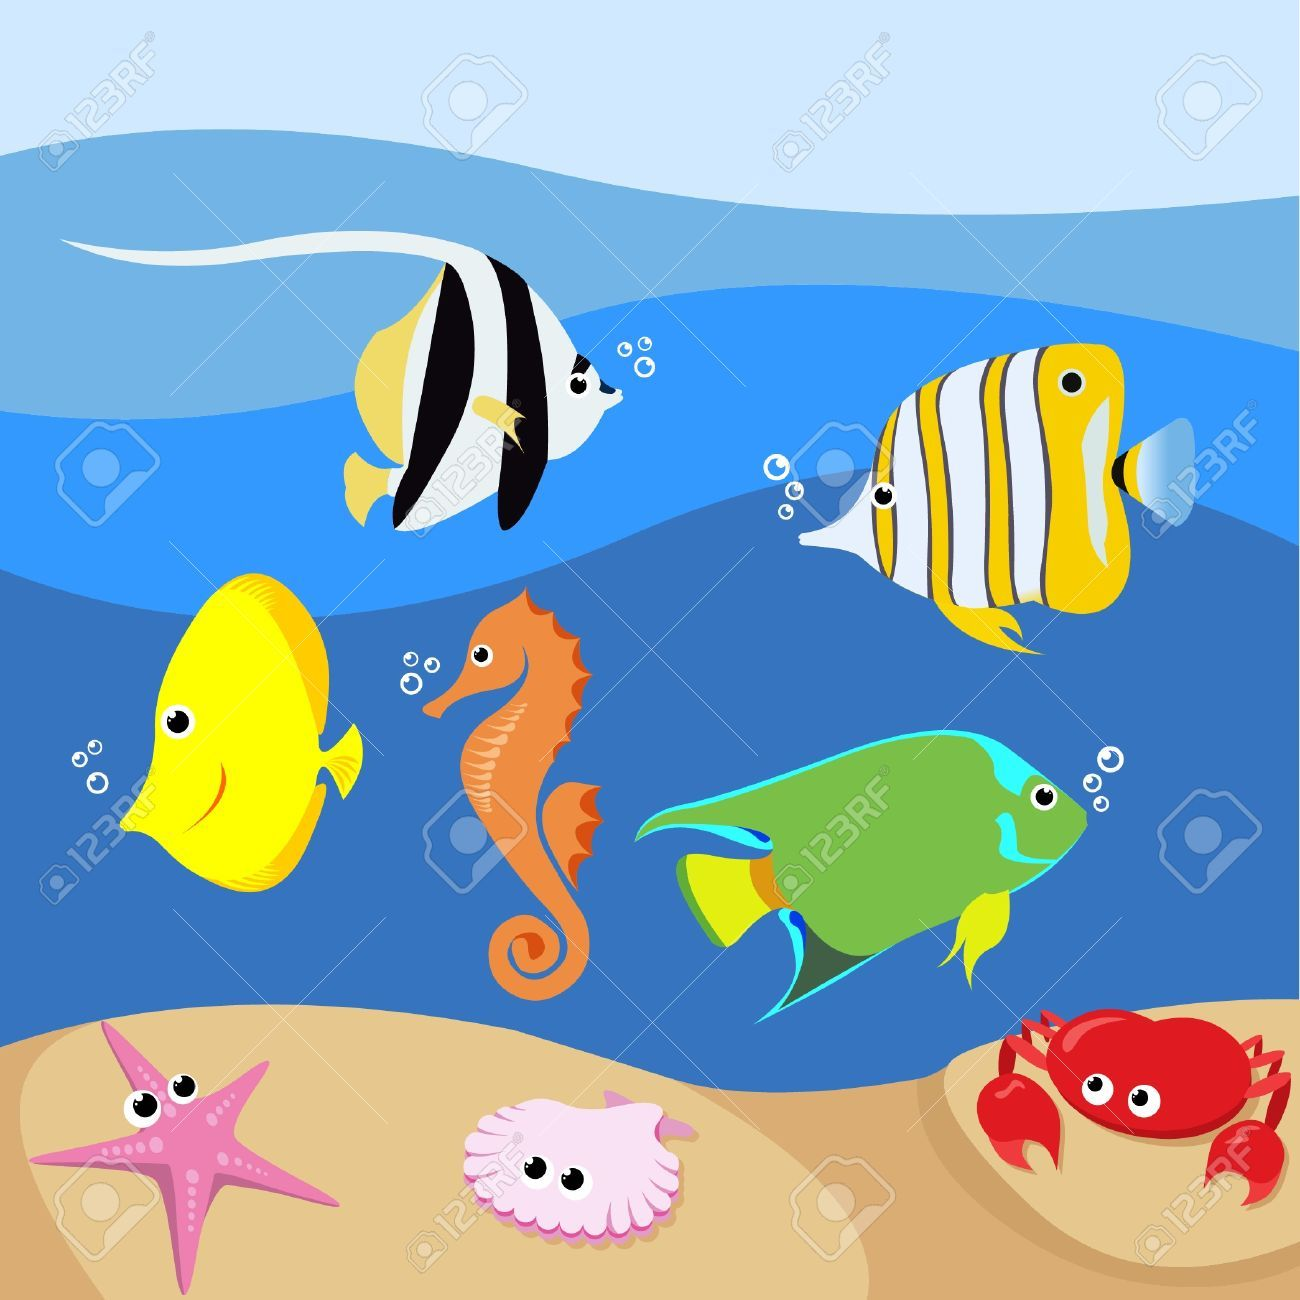 Pin By Mary Samir On Activities Marine Life Tropical Fish Fish Stock